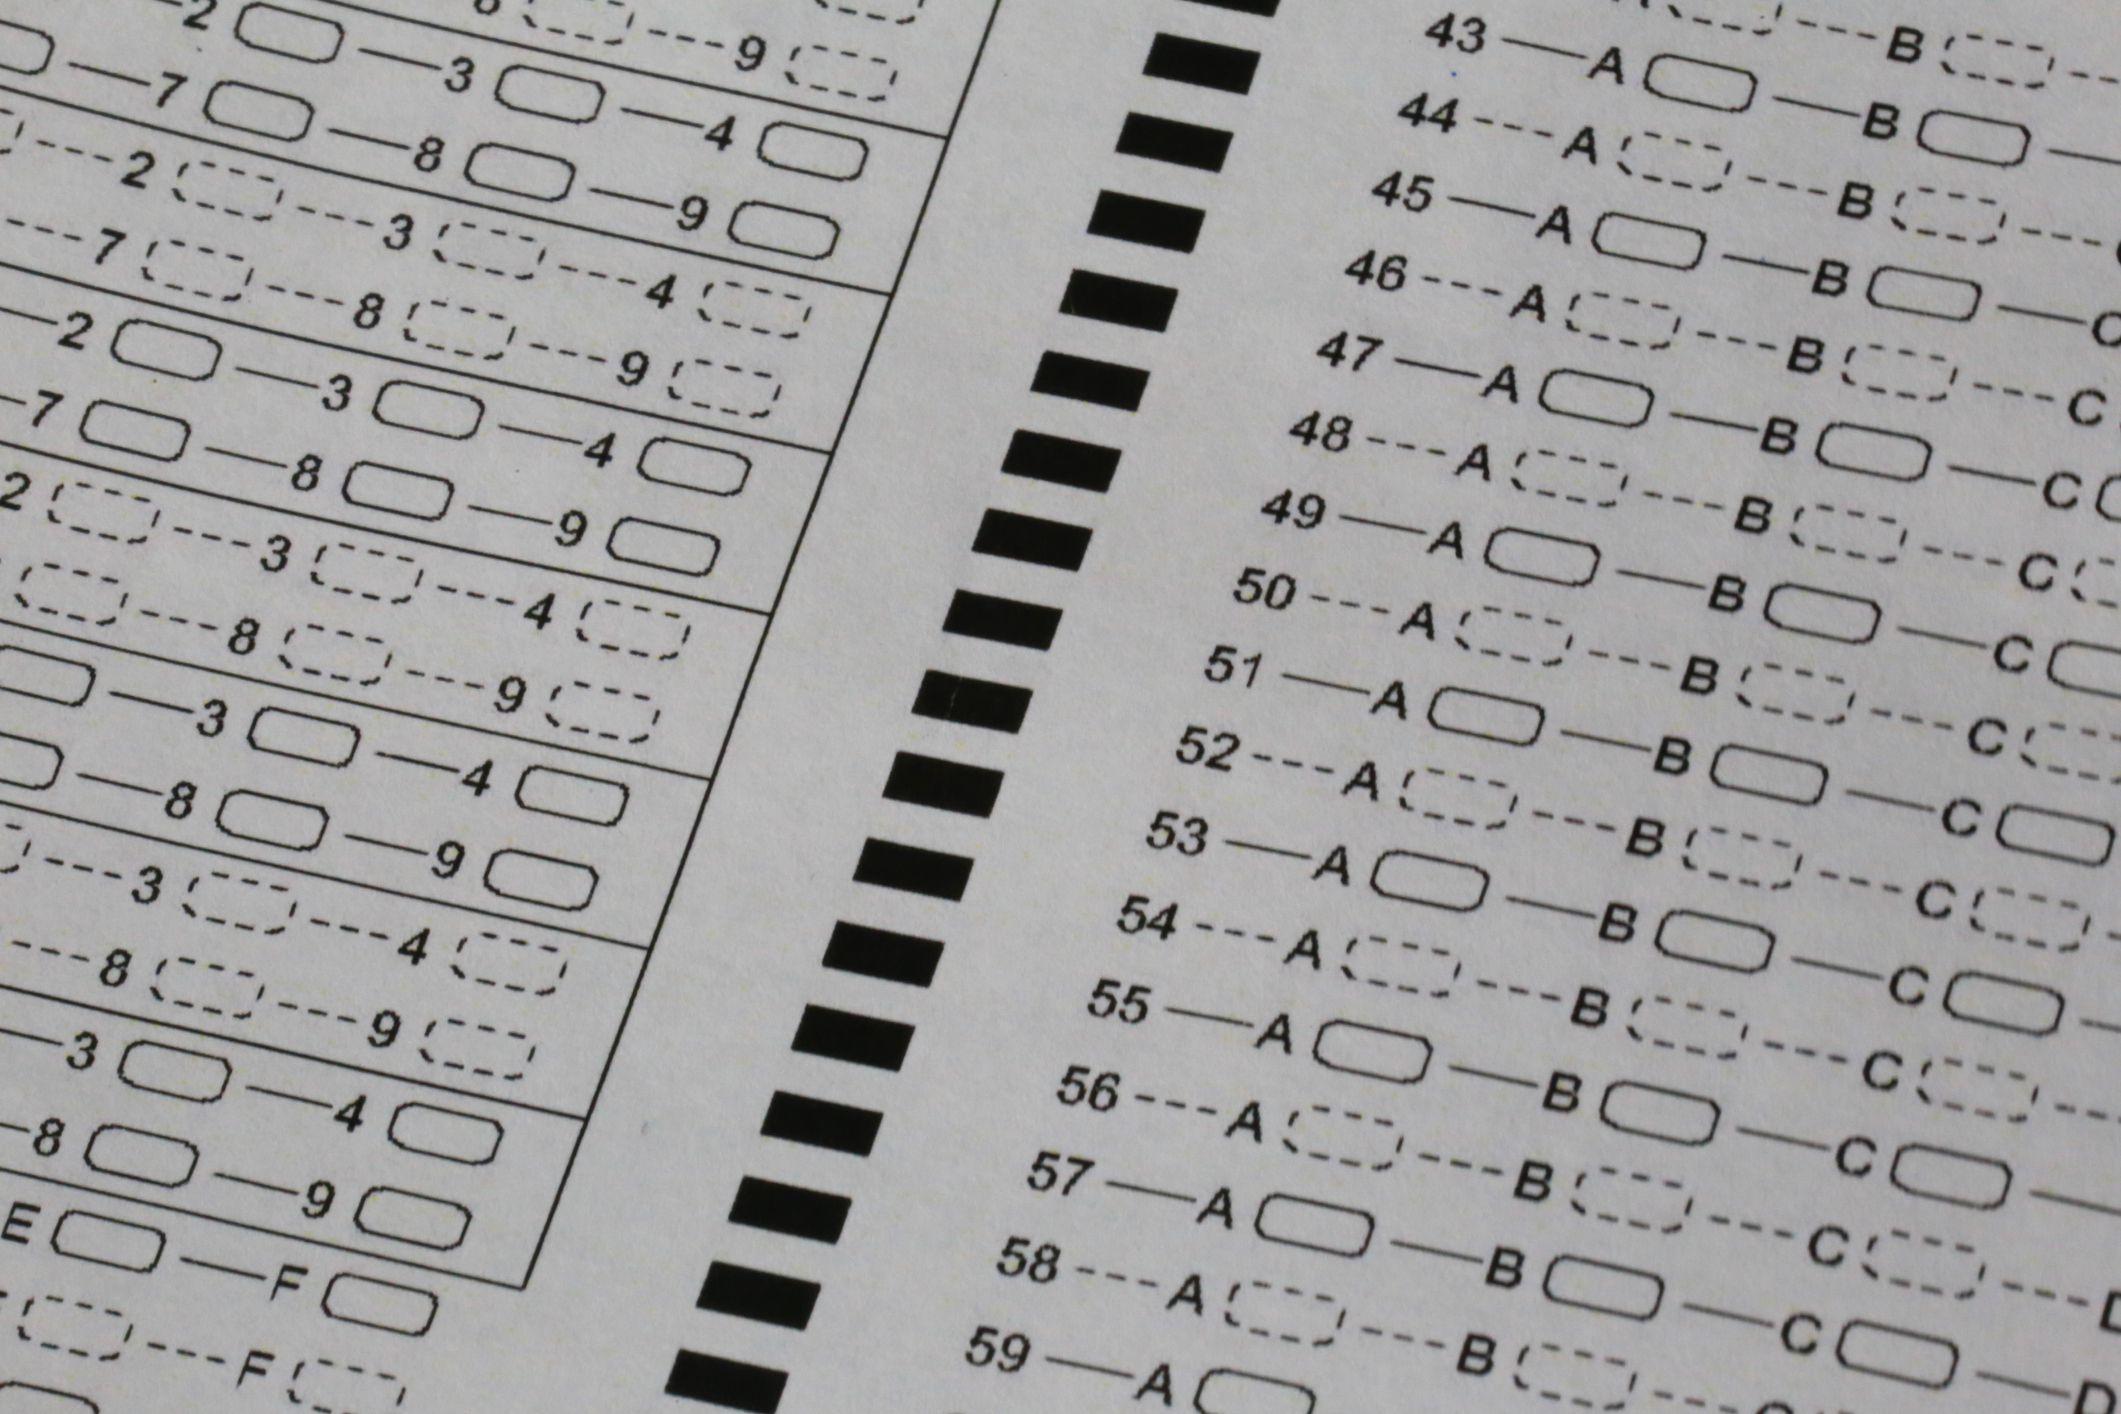 SAT Chemistry Subject Test Information